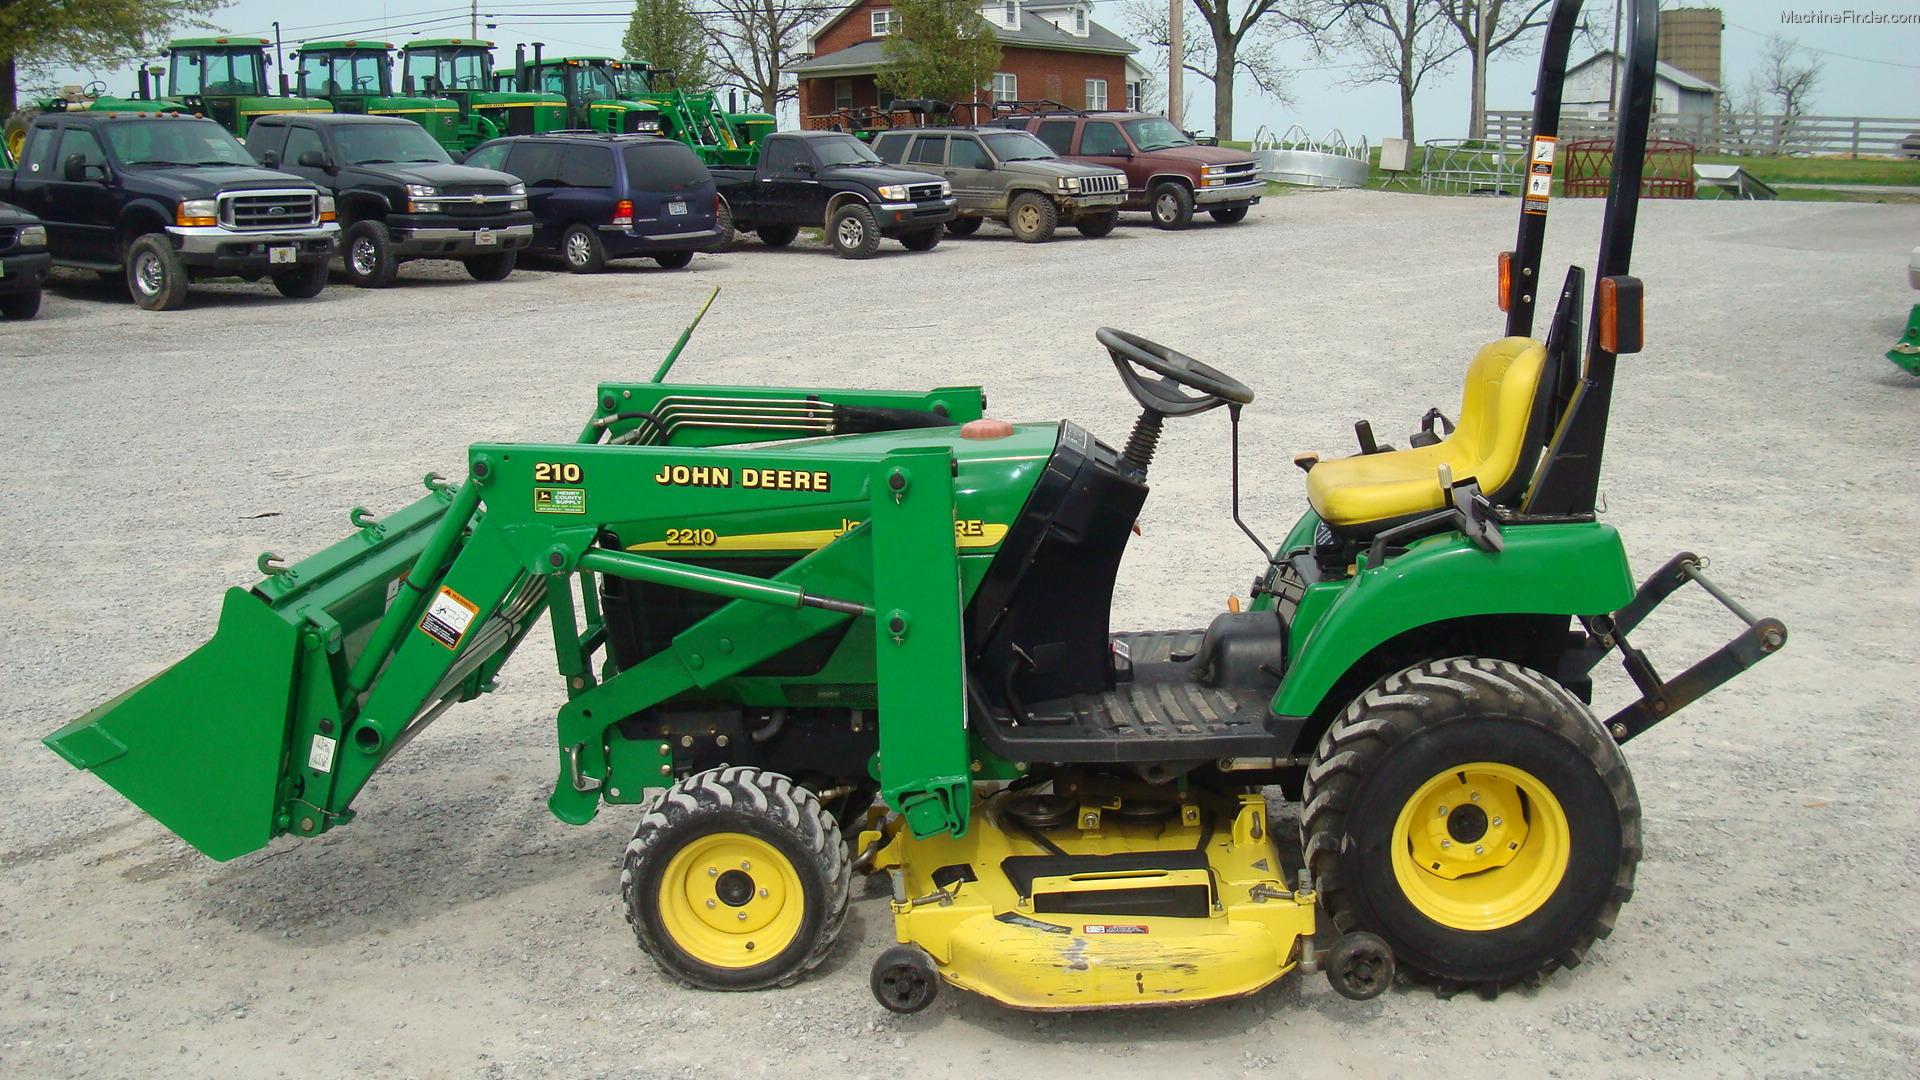 John Deere 4110 4wd Compact Utility Tractor – John Deere Compact Tractor Wiring Harness